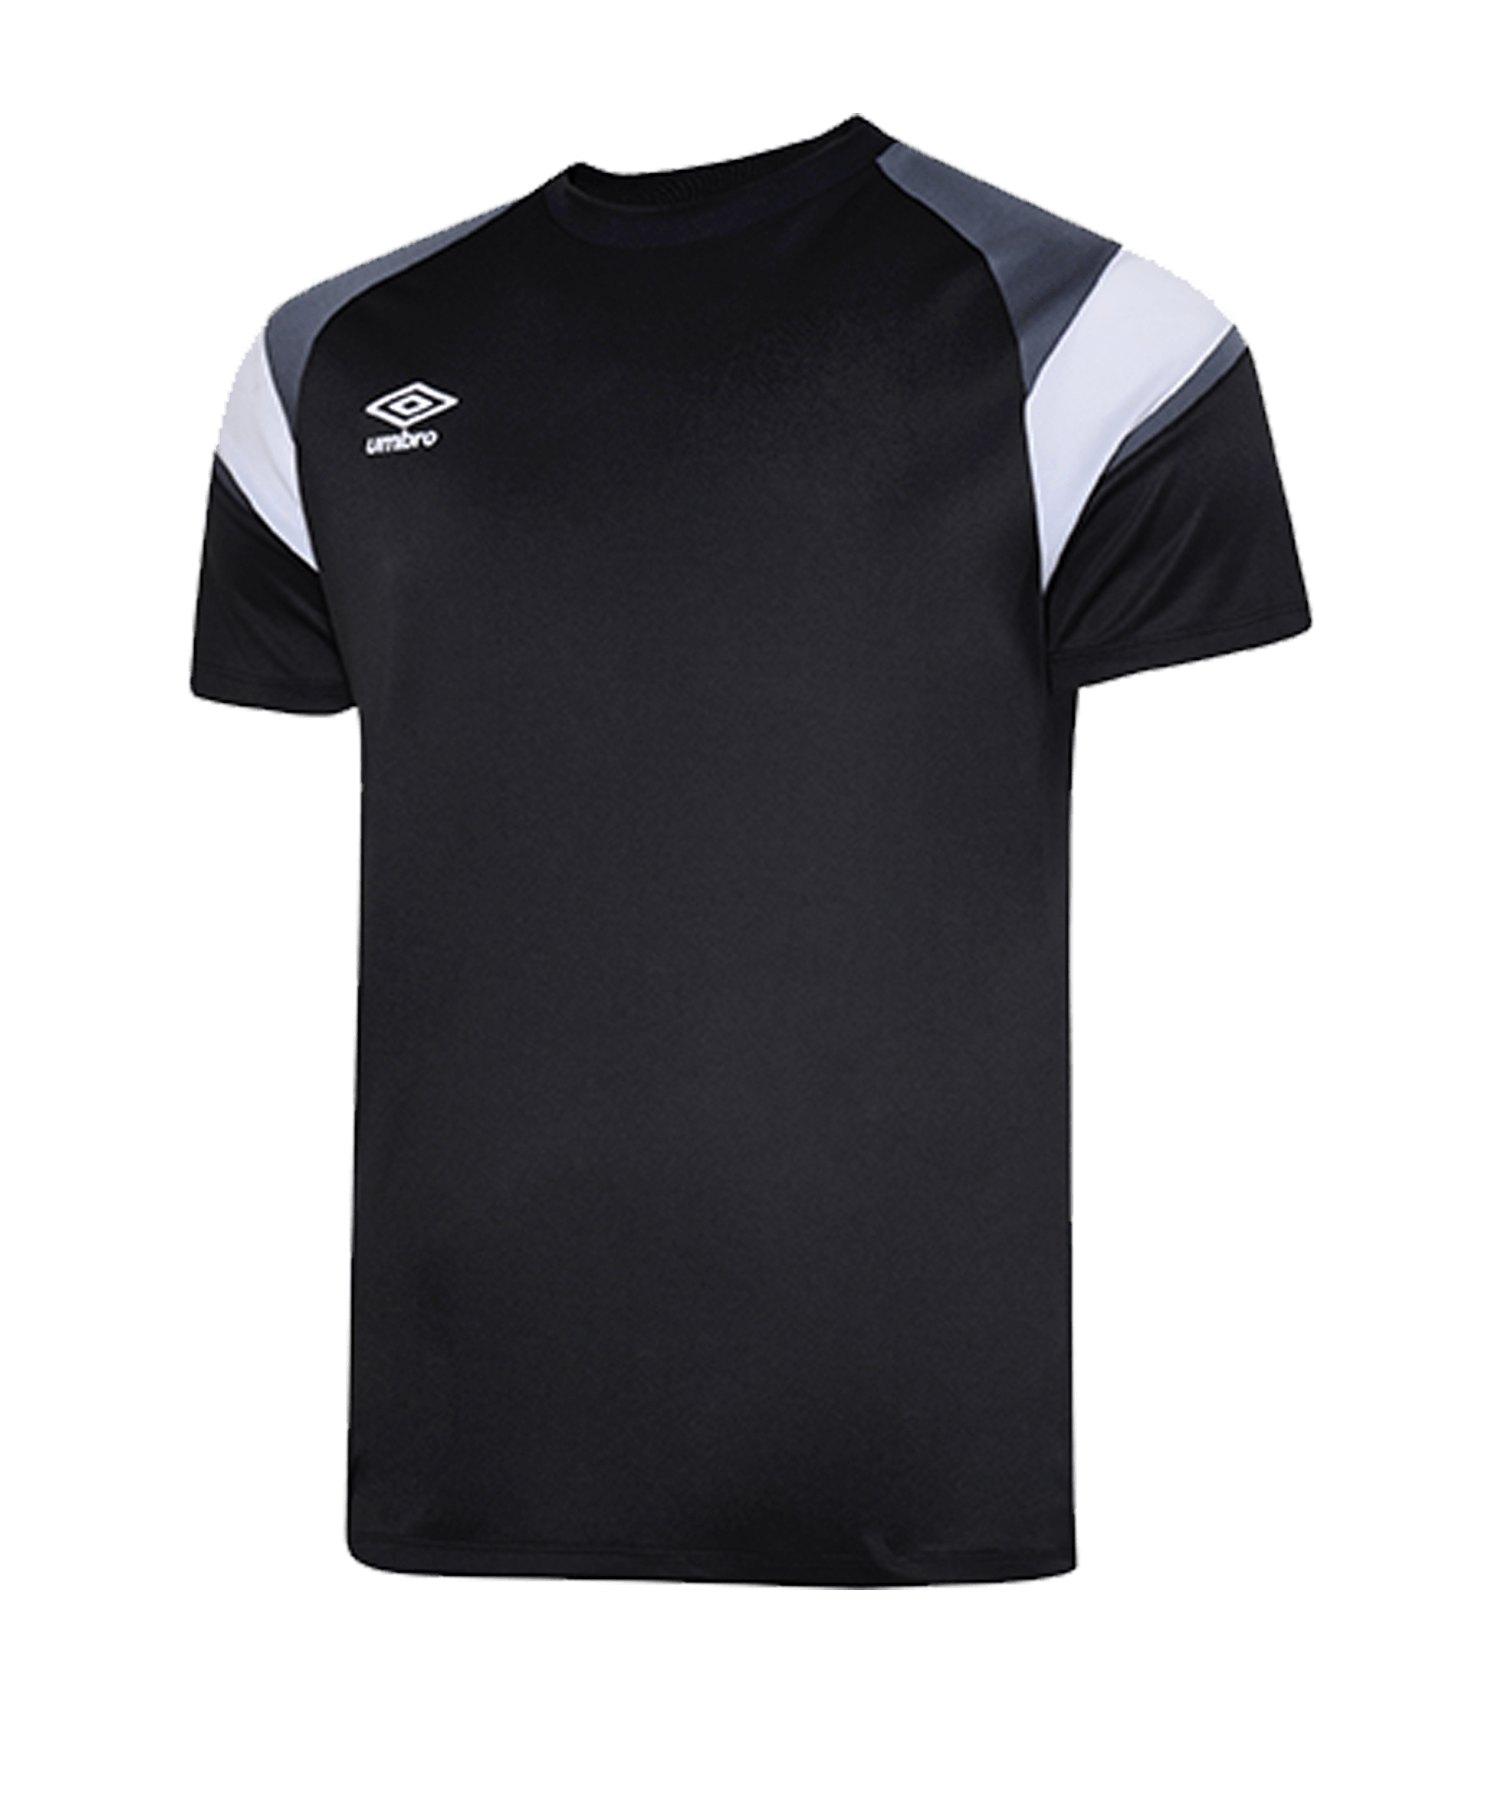 Umbro Training Jersey Trikot Schwarz FGR6 - schwarz